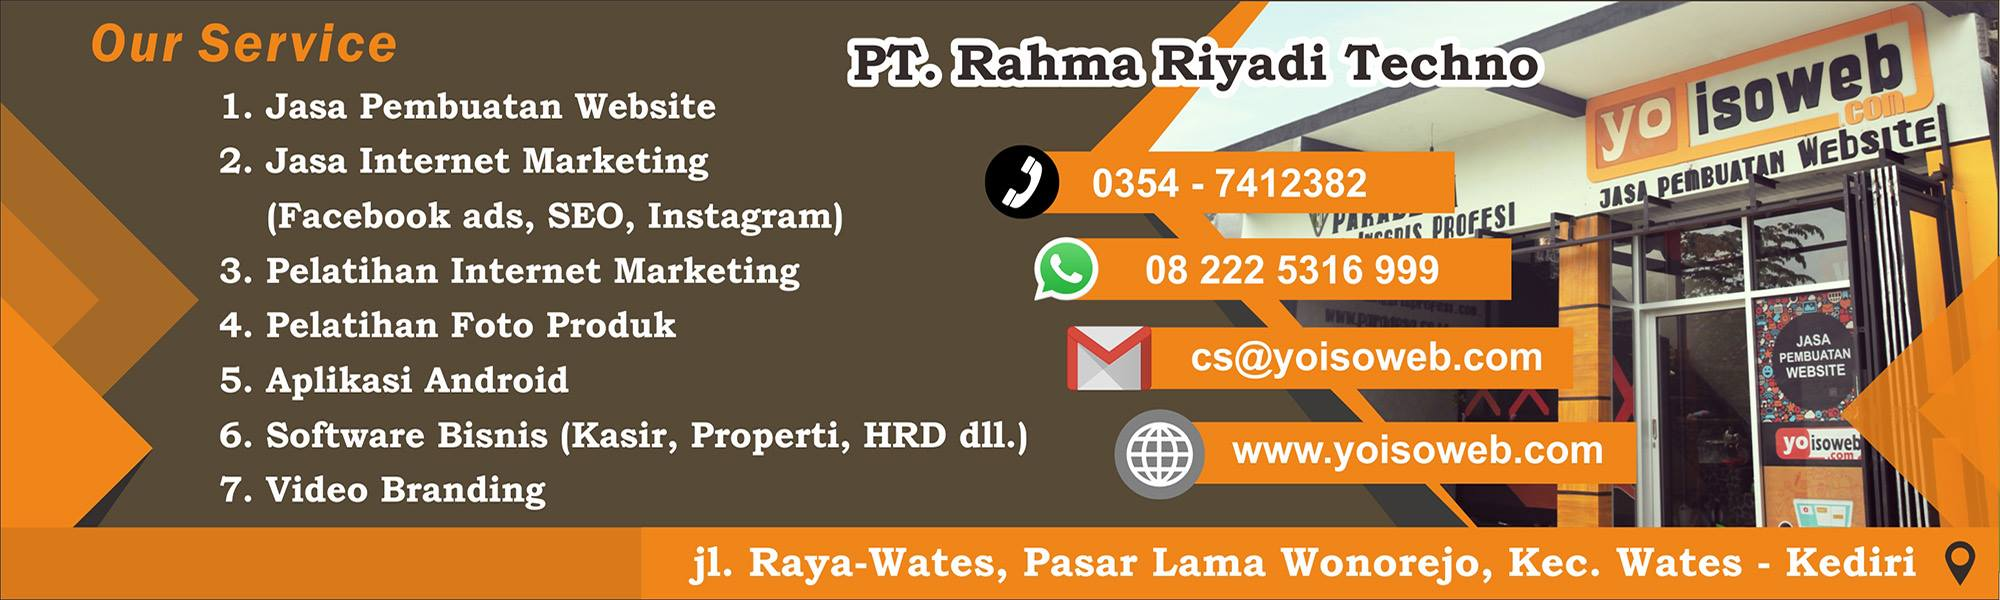 Jasa website sekolah Banjarnegara 08 222 5316 999